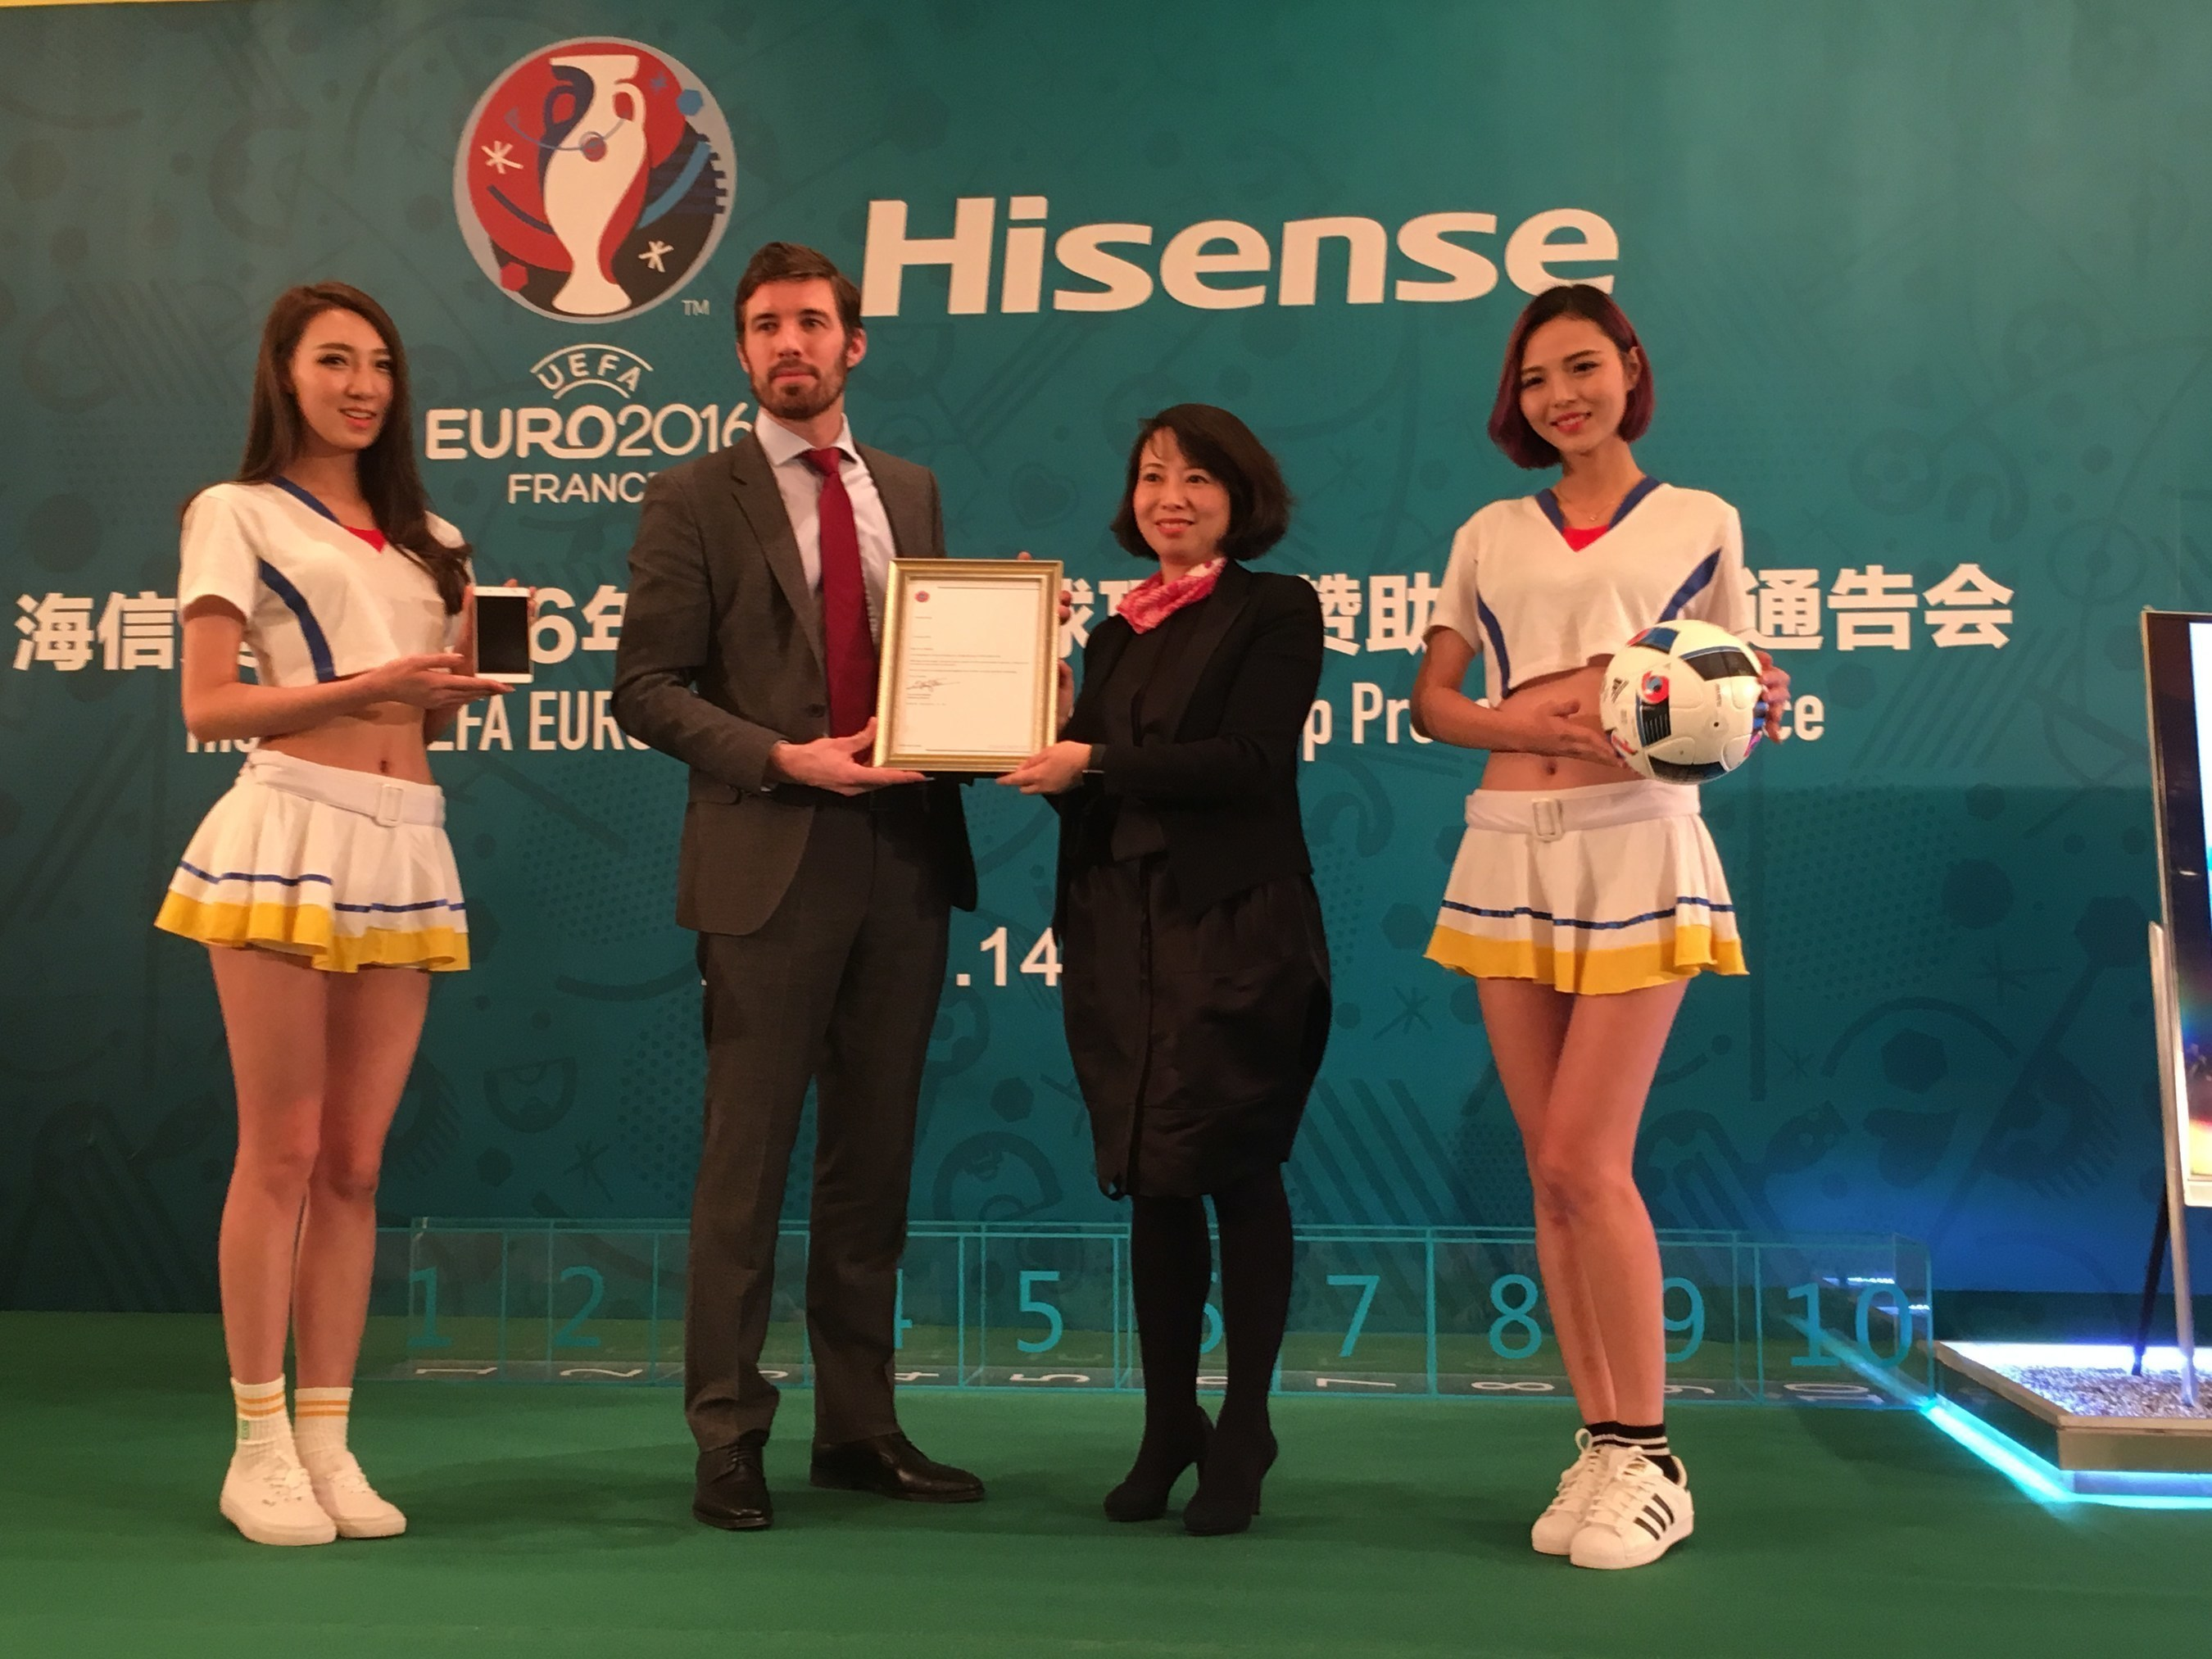 UEFA officer presents Hisense sponsorship certificate